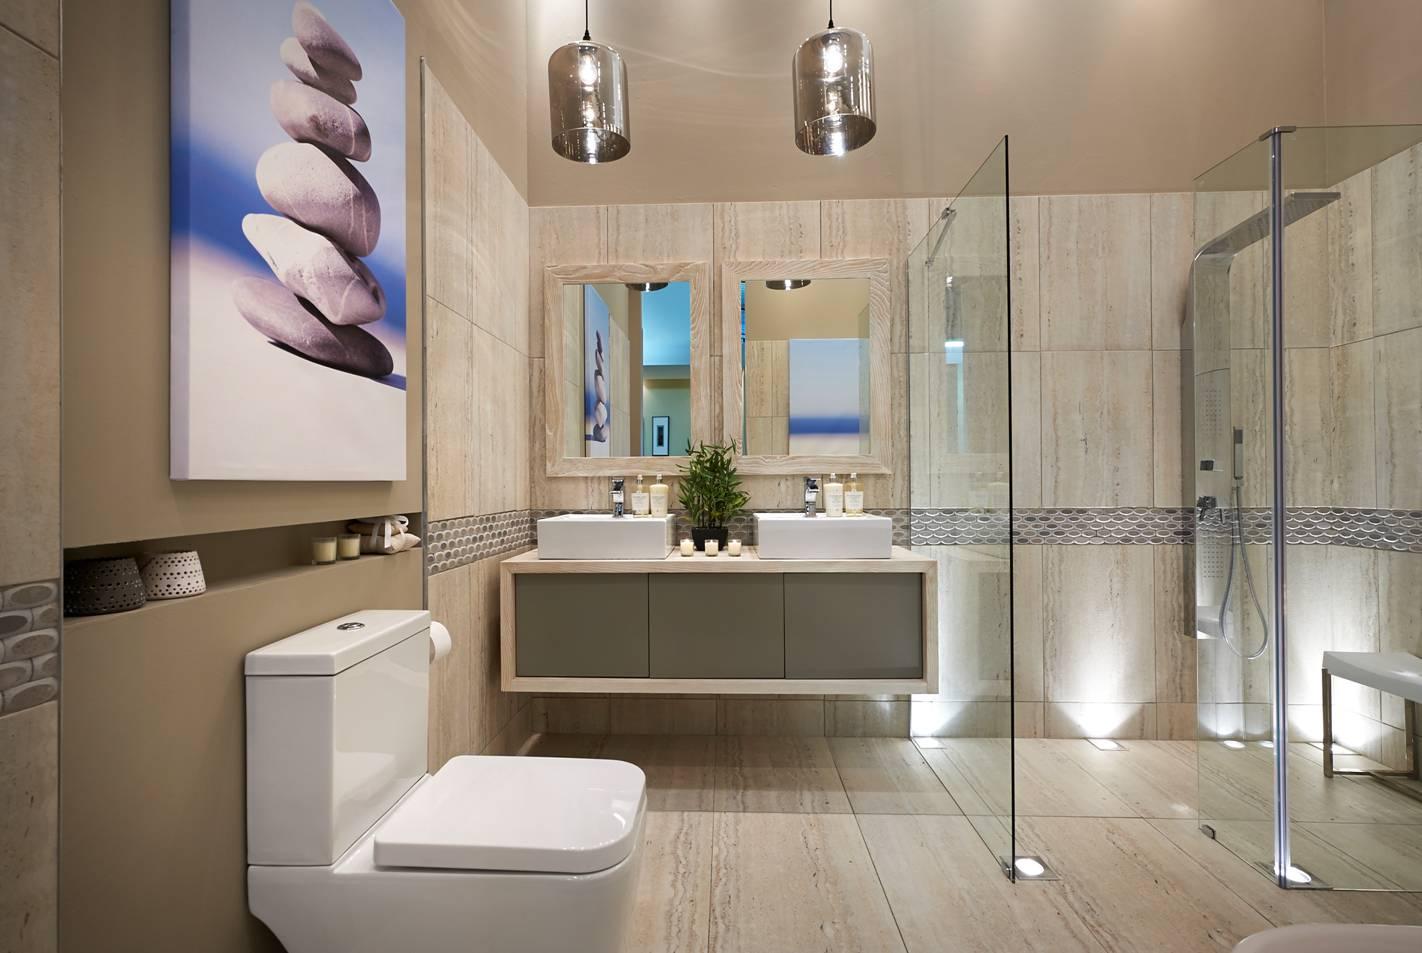 بالصور تصميم حمامات , اجمل ديكورات الحمامات 3285 7